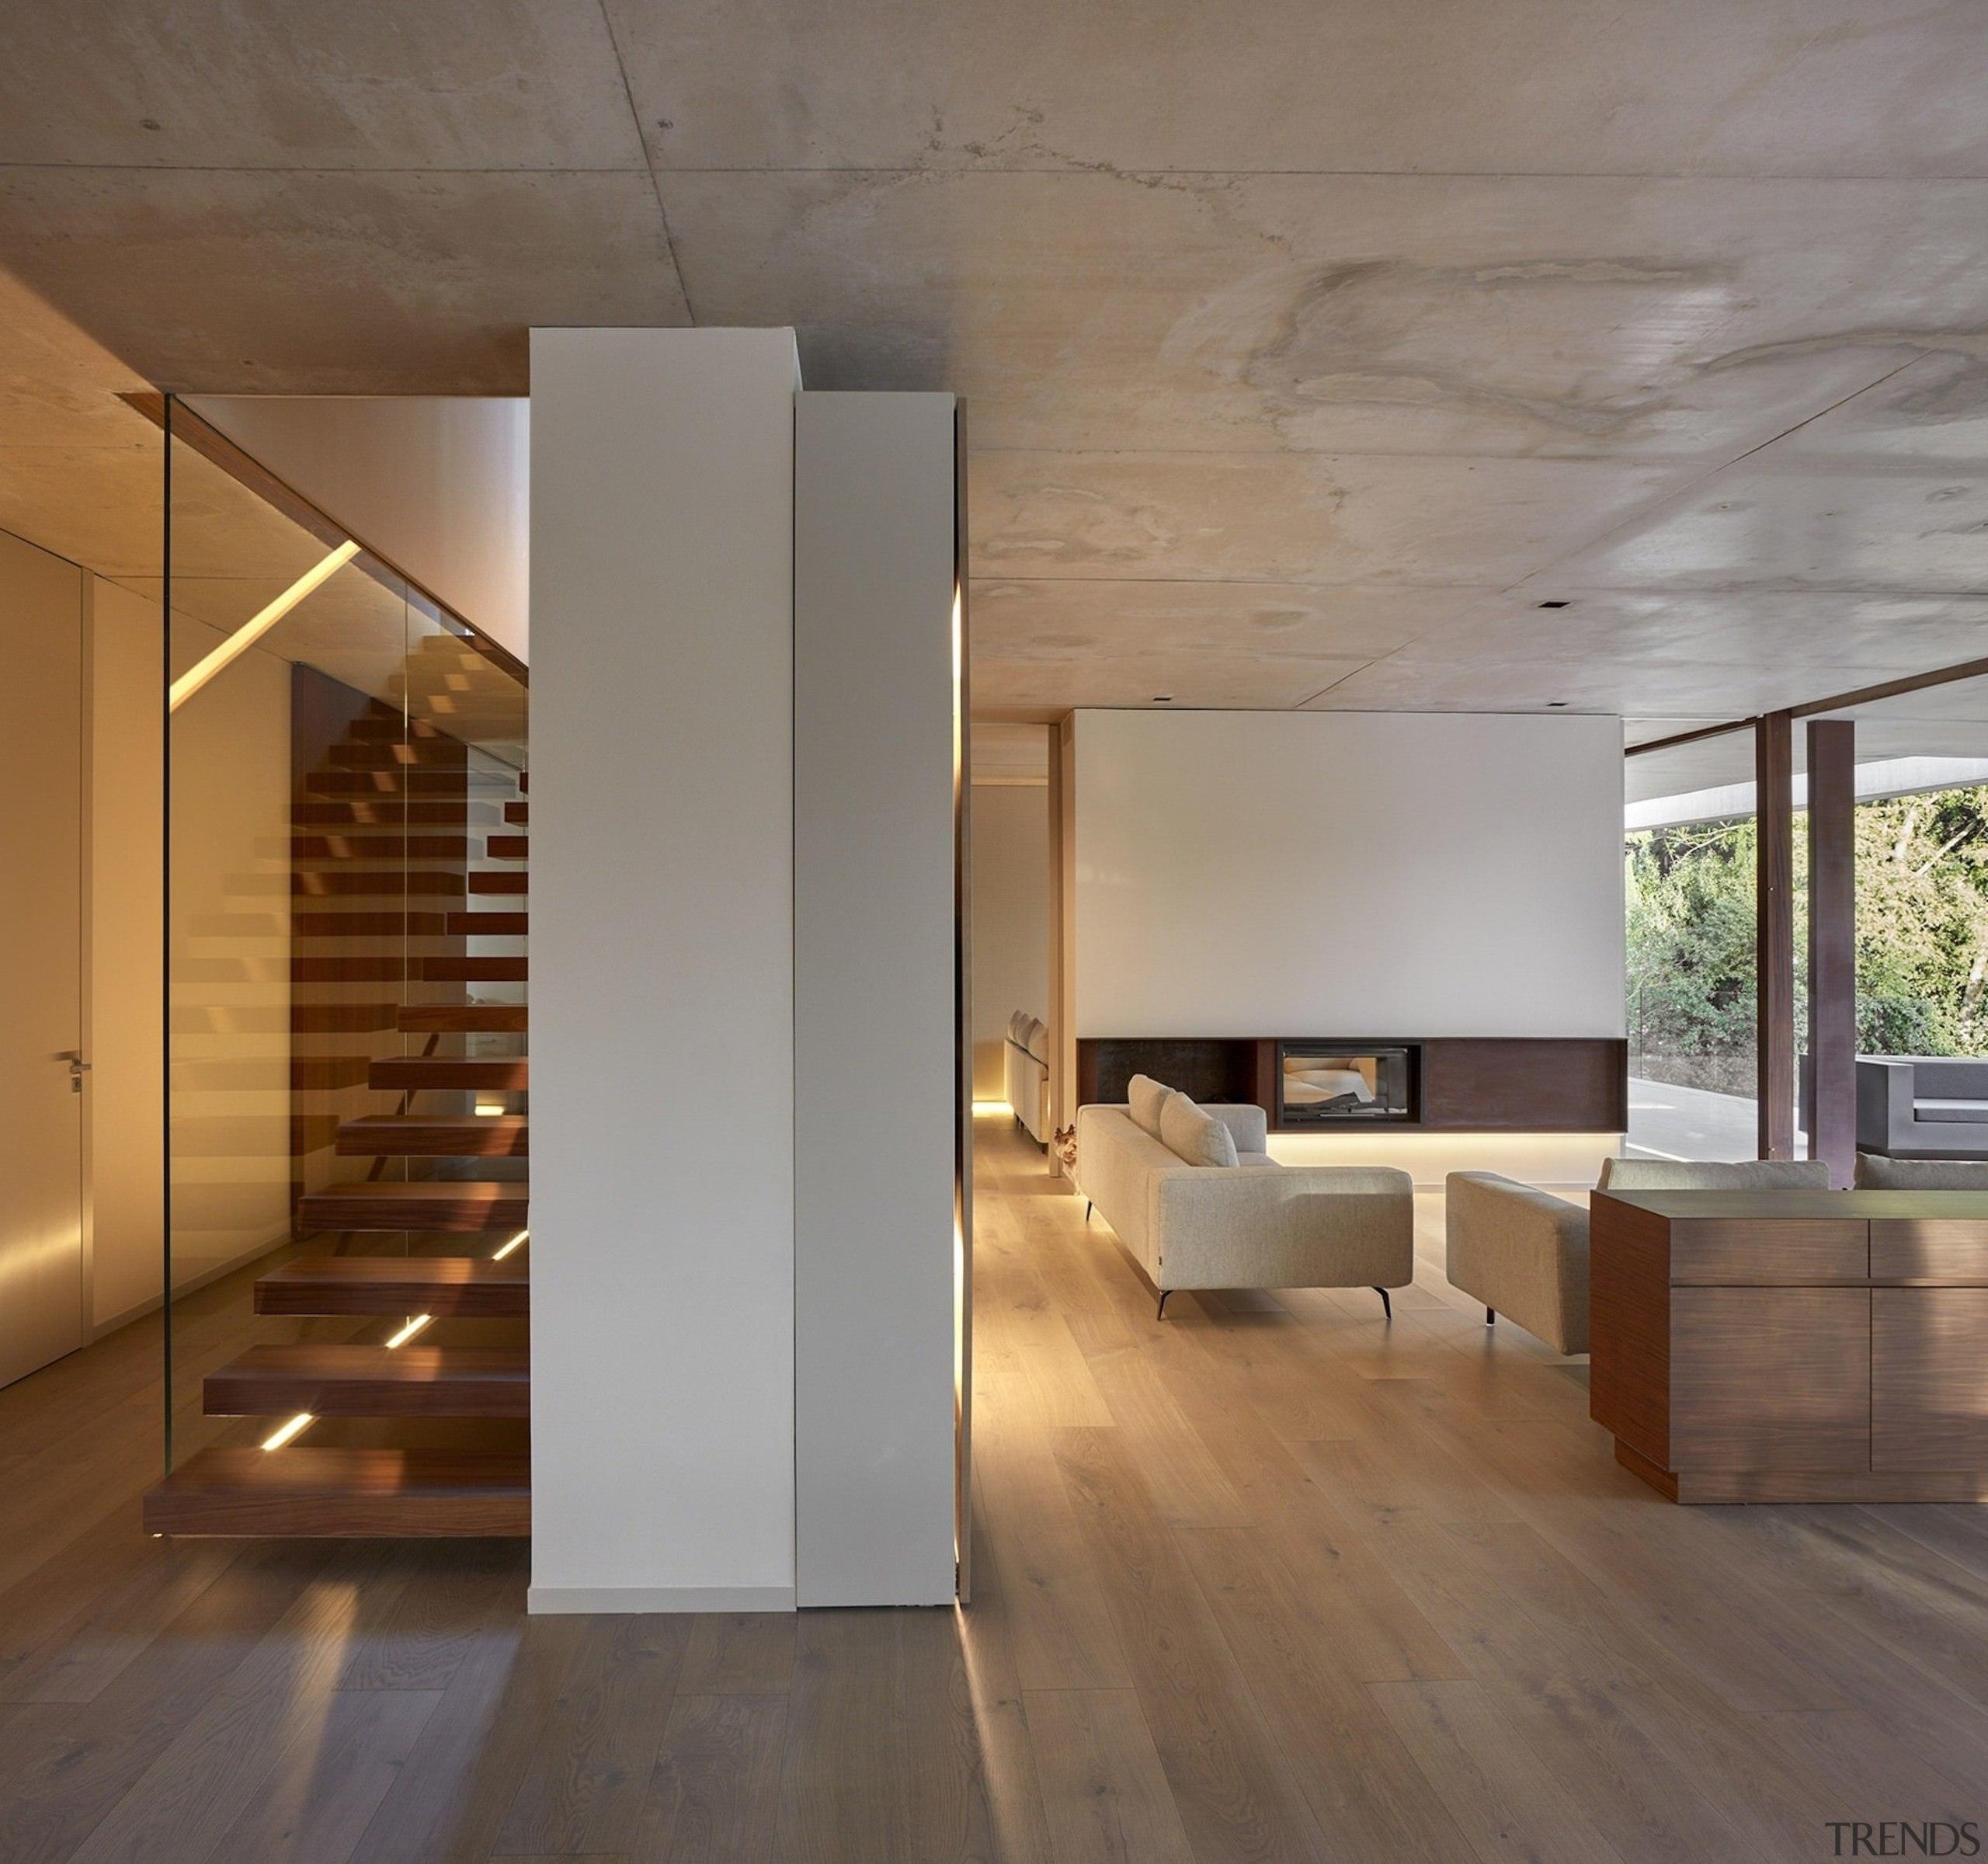 Architect: Ramón Esteve Estudio de Arquitectura architecture, ceiling, daylighting, floor, flooring, hardwood, house, interior design, laminate flooring, loft, stairs, wood, wood flooring, gray, brown